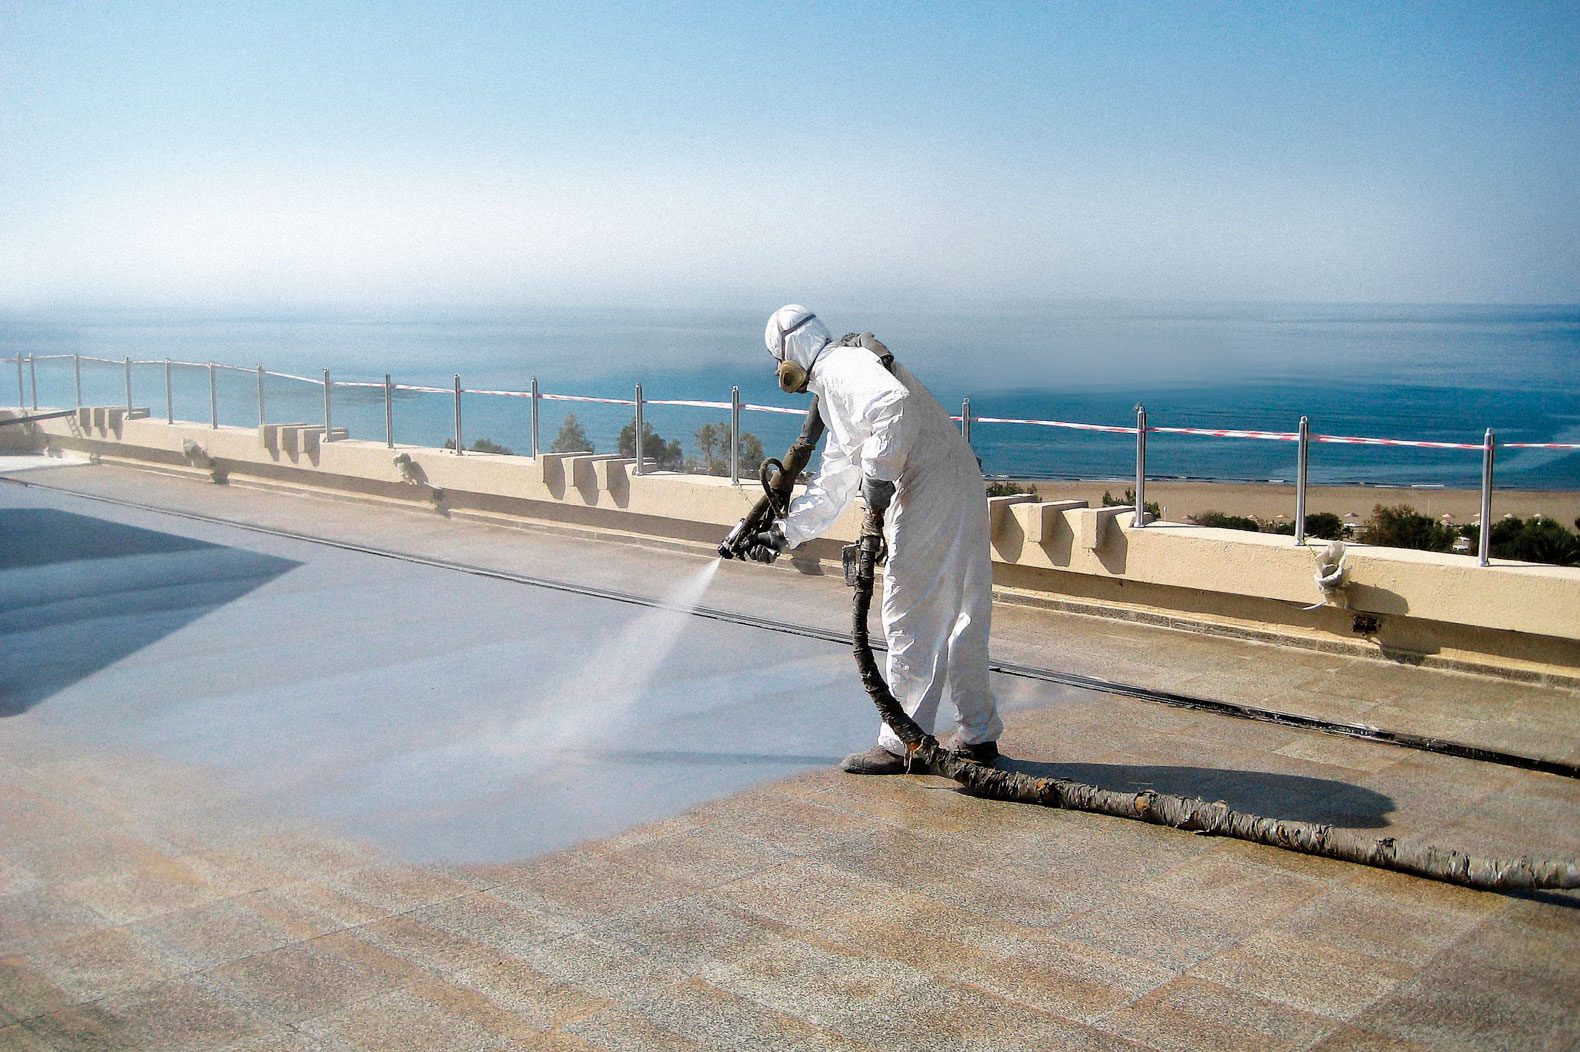 Solución de impermeabilización con poliurea en Alicante